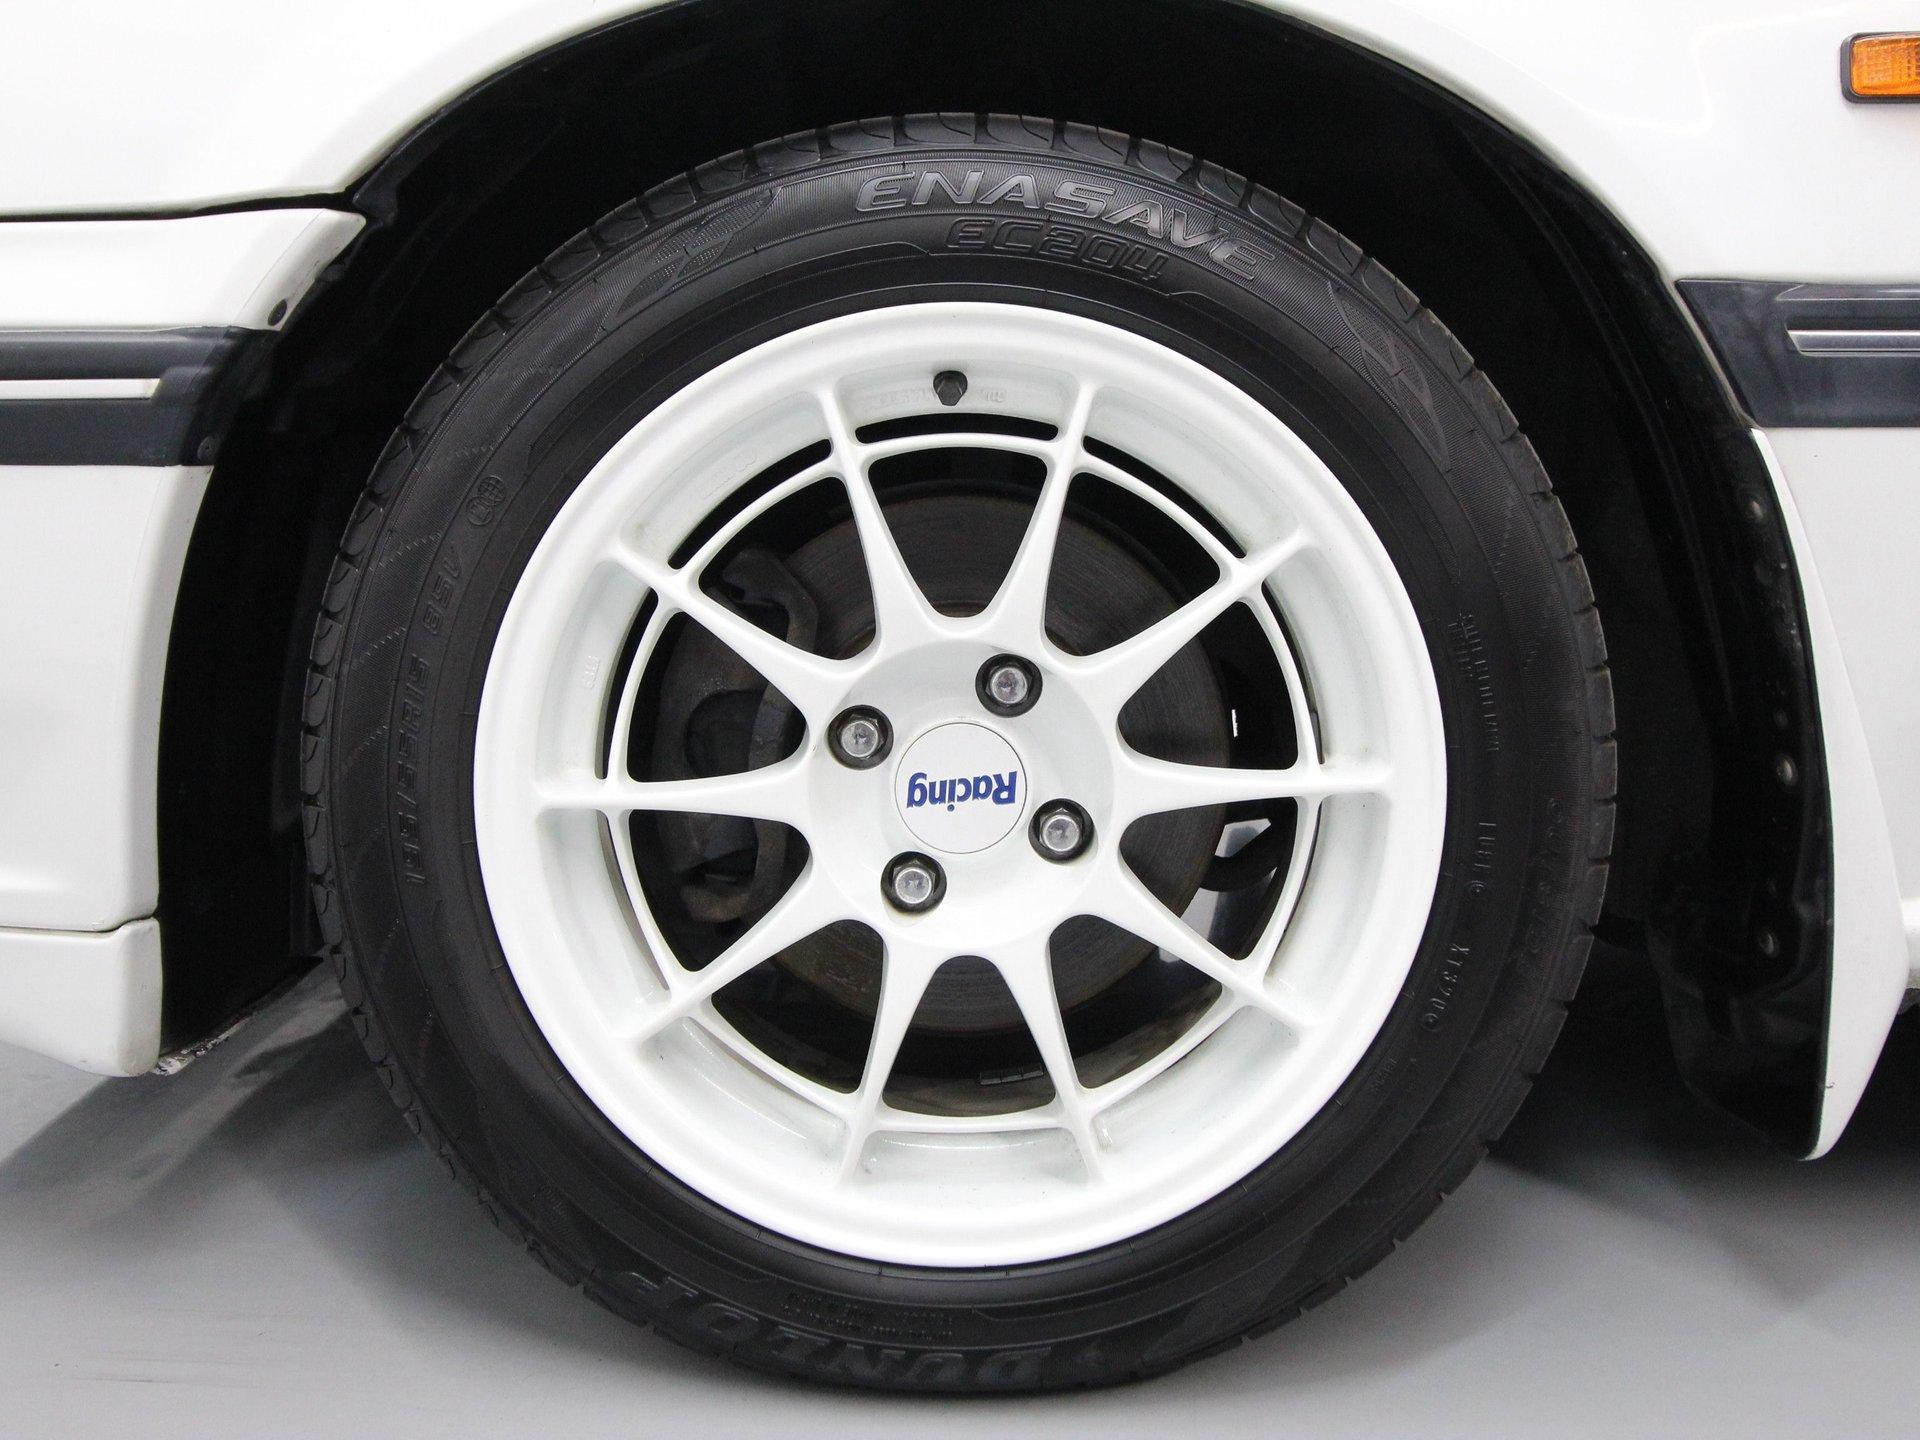 1988 Honda Prelude